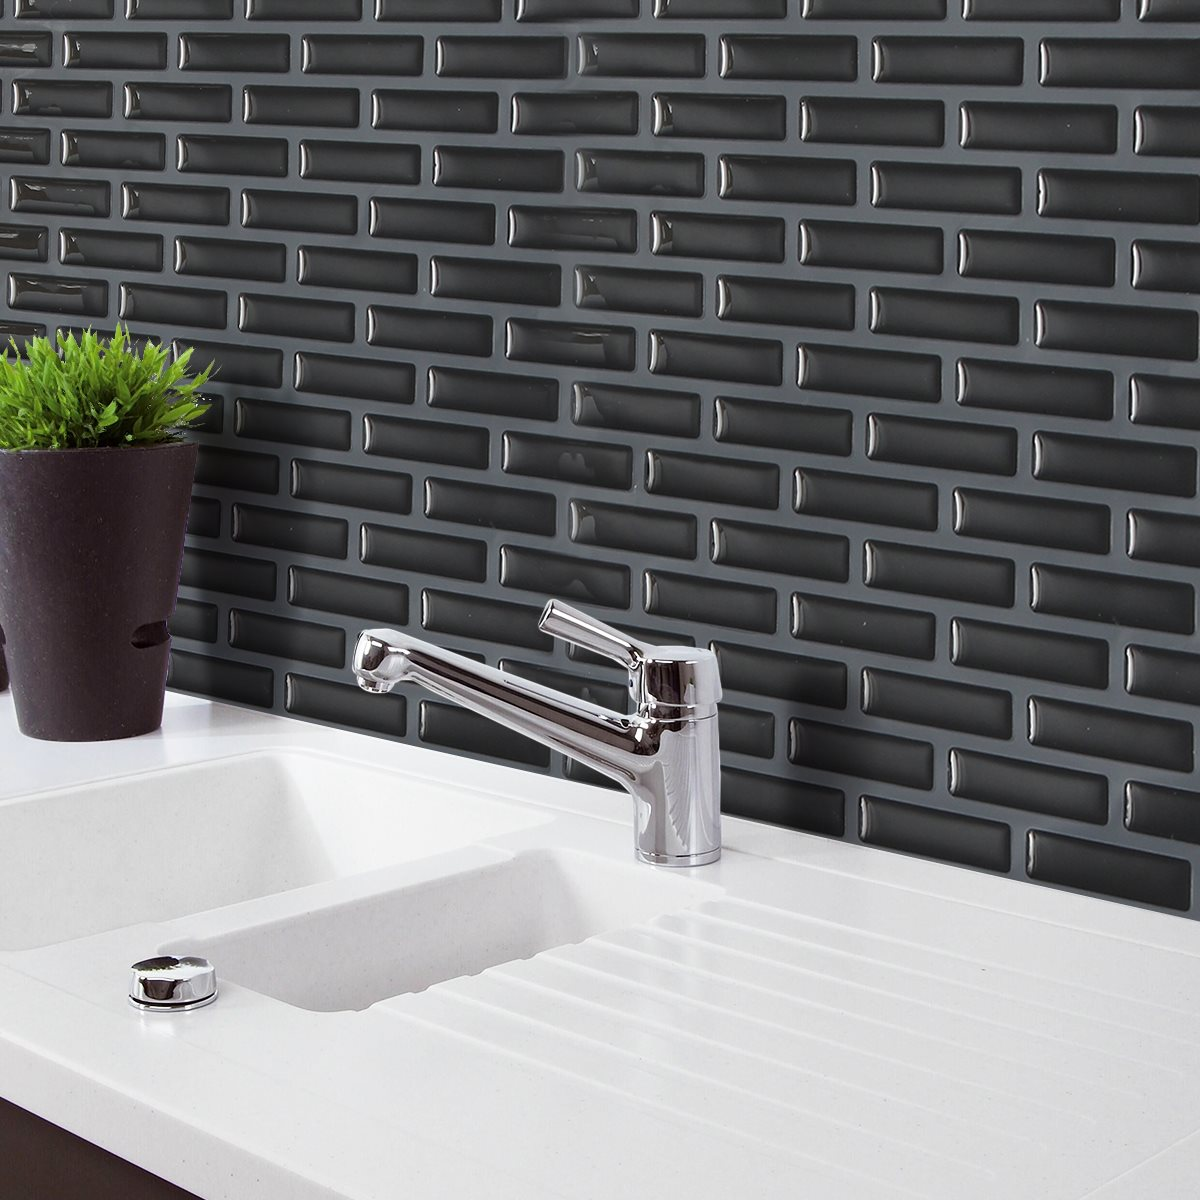 Best Kitchen Gallery: 3d Black Brick M Osaic Wall Sticker Kitchen Bathroom Foil Beauty 3d of Foil Kitchen Tile on rachelxblog.com